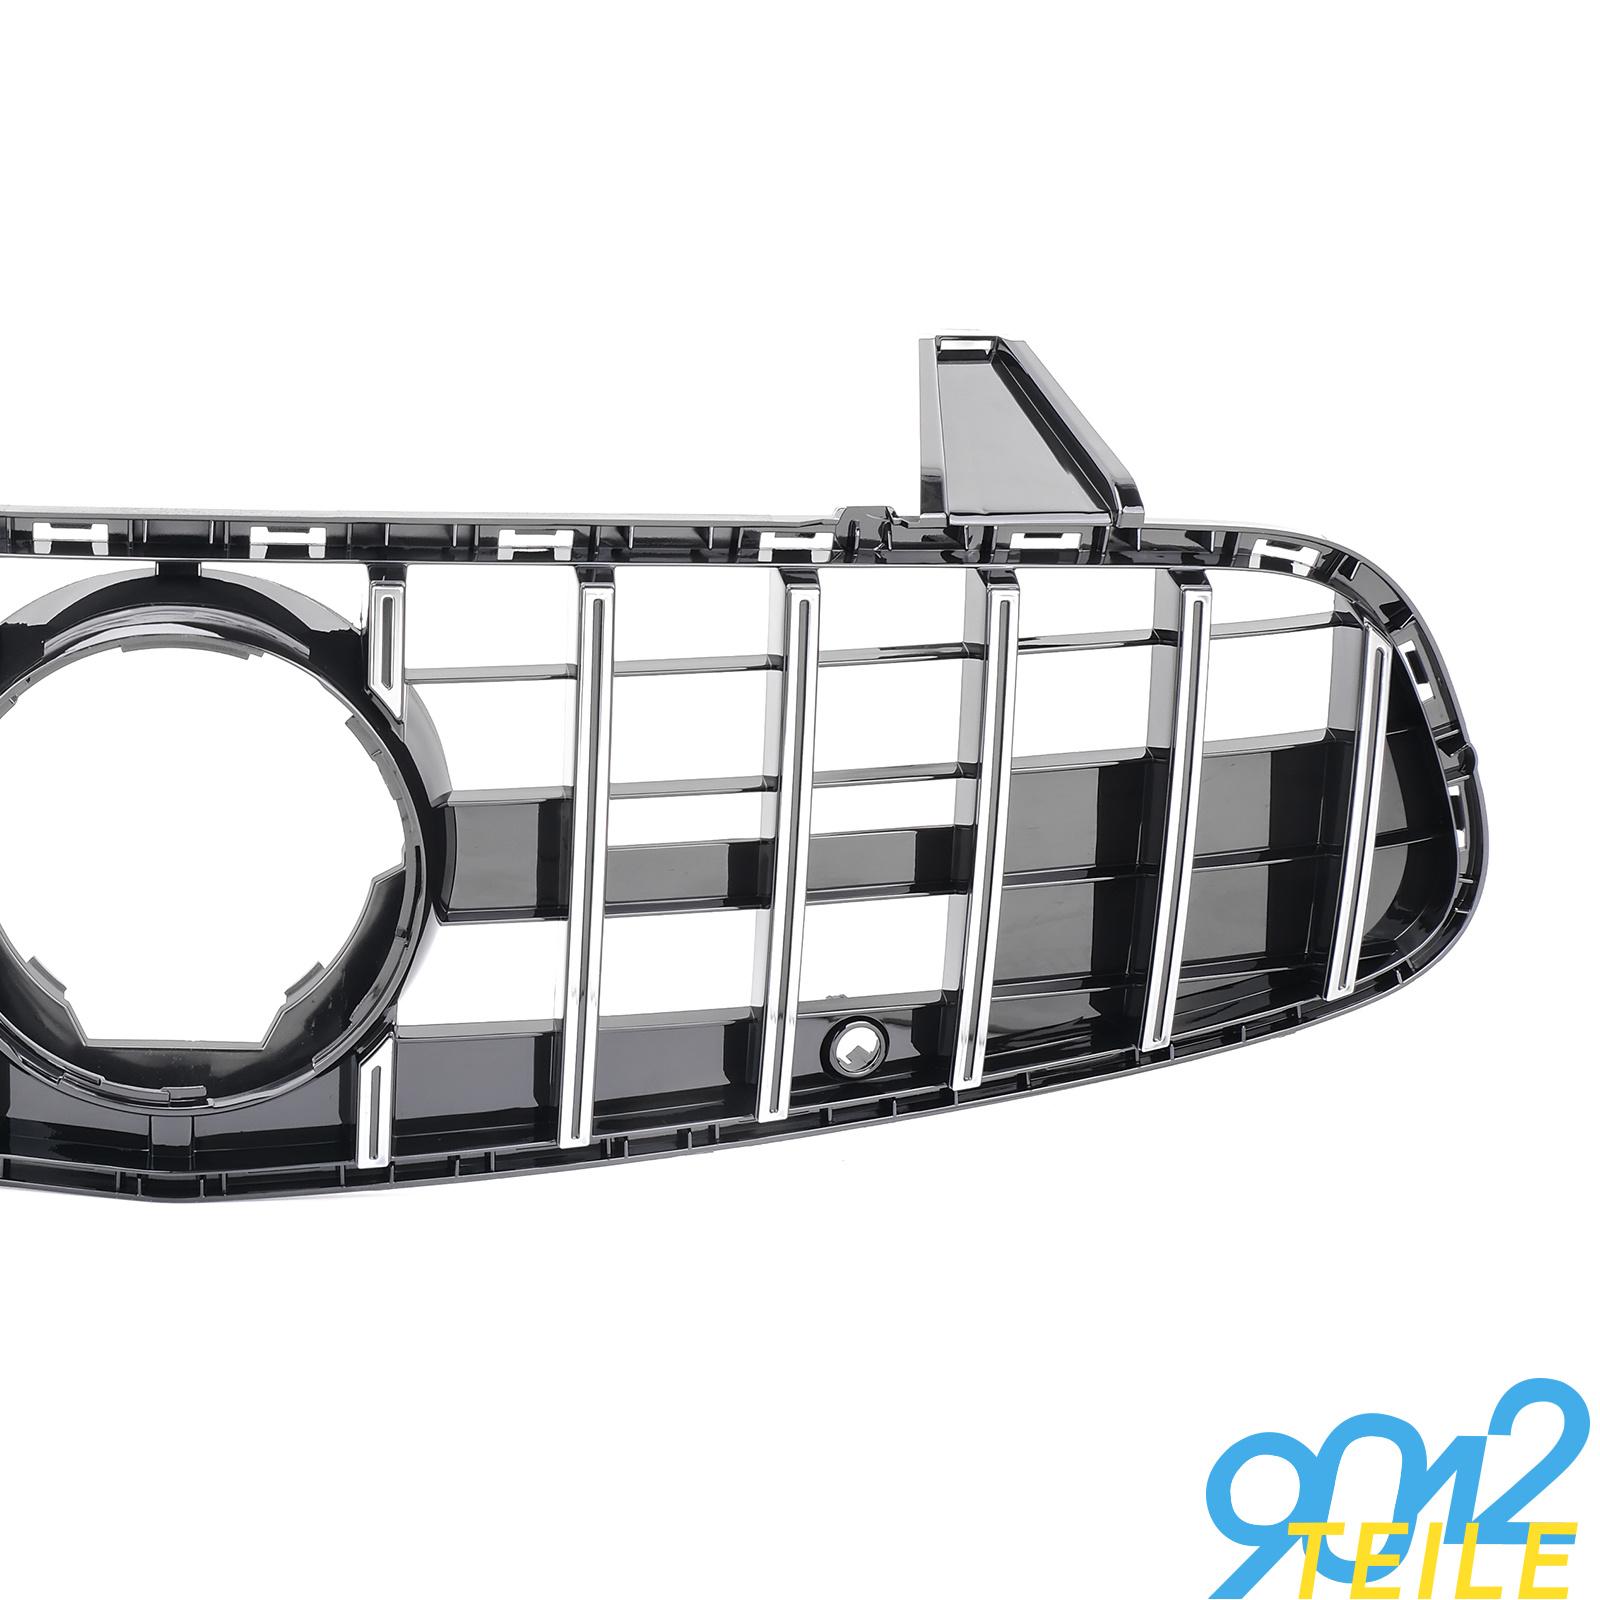 fuer-Mercedes-GT-LOOK-Grill-SL-Klasse-R231-W231-GLANZ-CHROM-Frontgrill-ab-2016 Indexbild 3